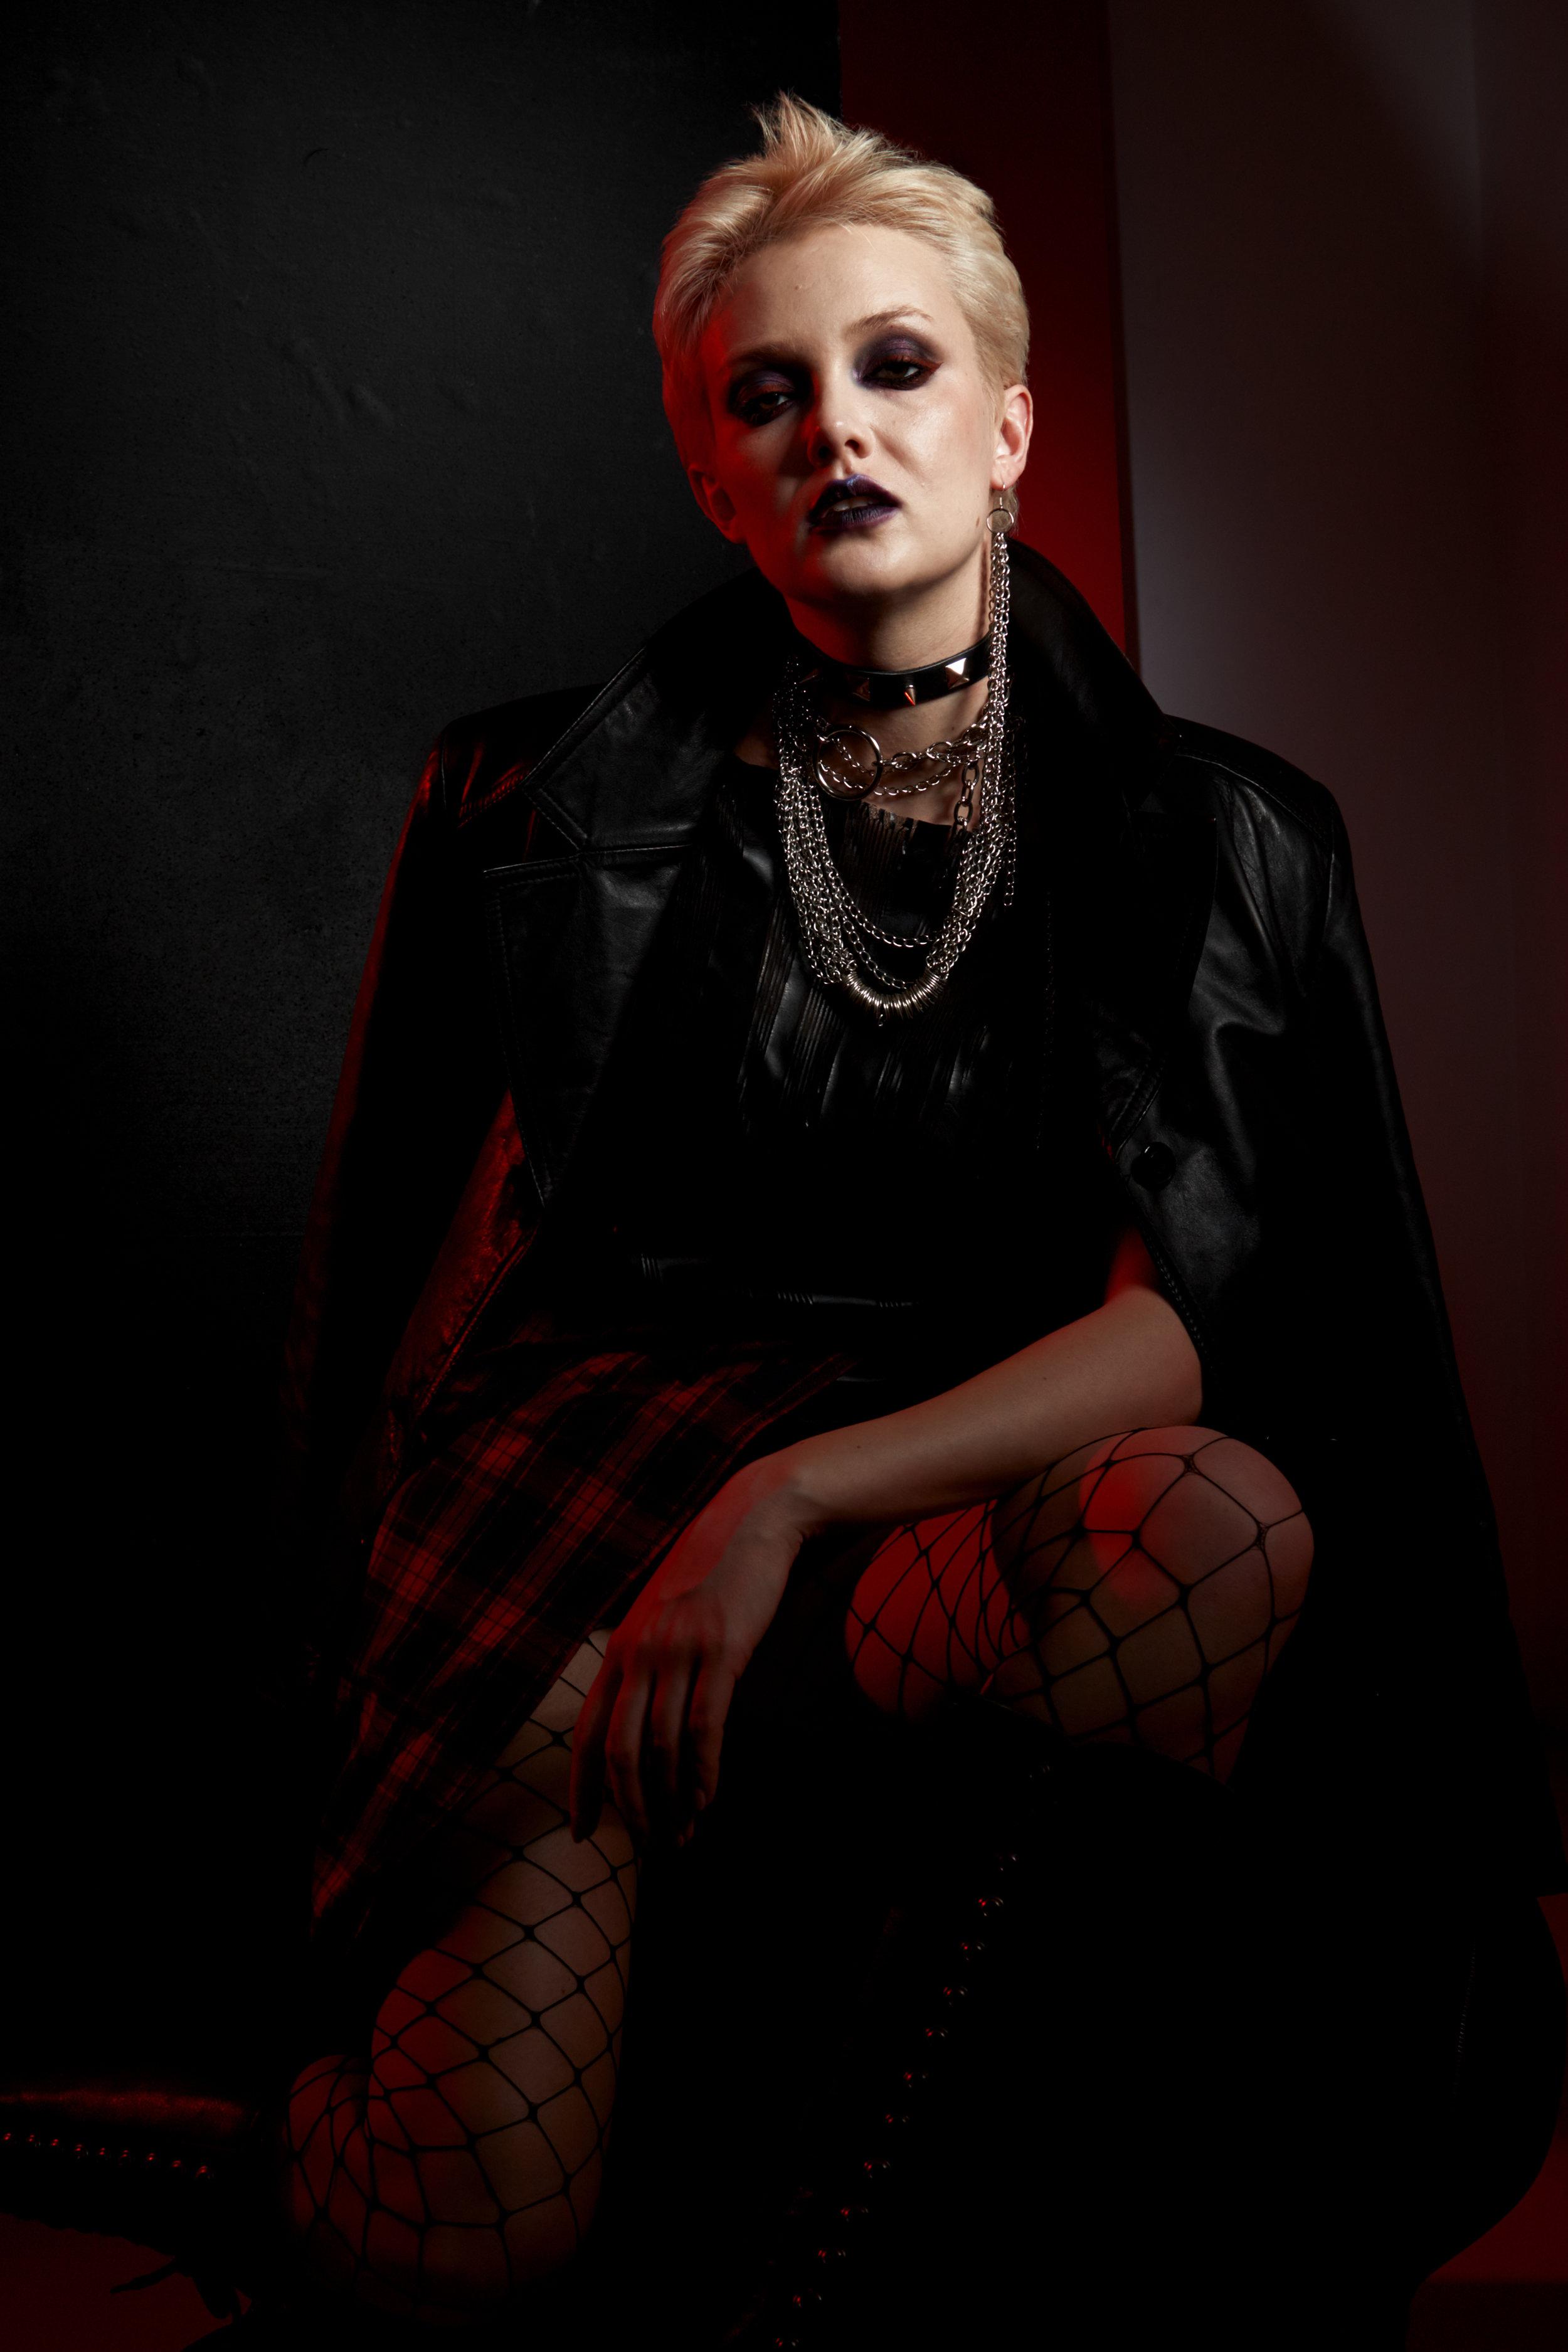 Leather jacket, leather coat, plaid skirt - Nadezda Sizova Leather T-shirt and dress - designer Nadezda Sizova Chains and shoes, boots, tights - Stylist property